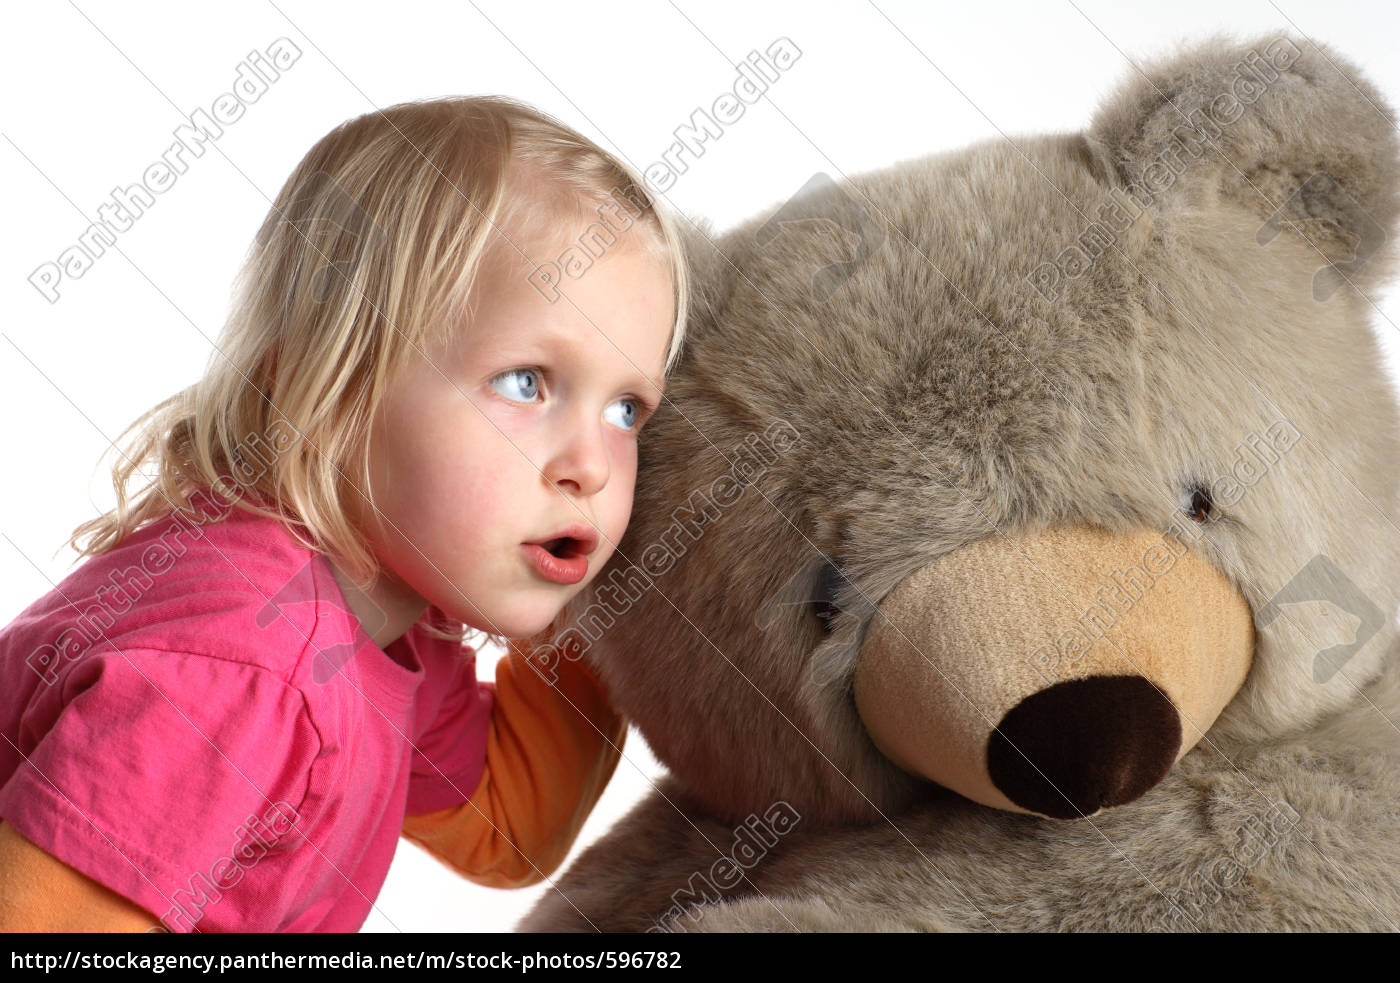 teddy - 596782